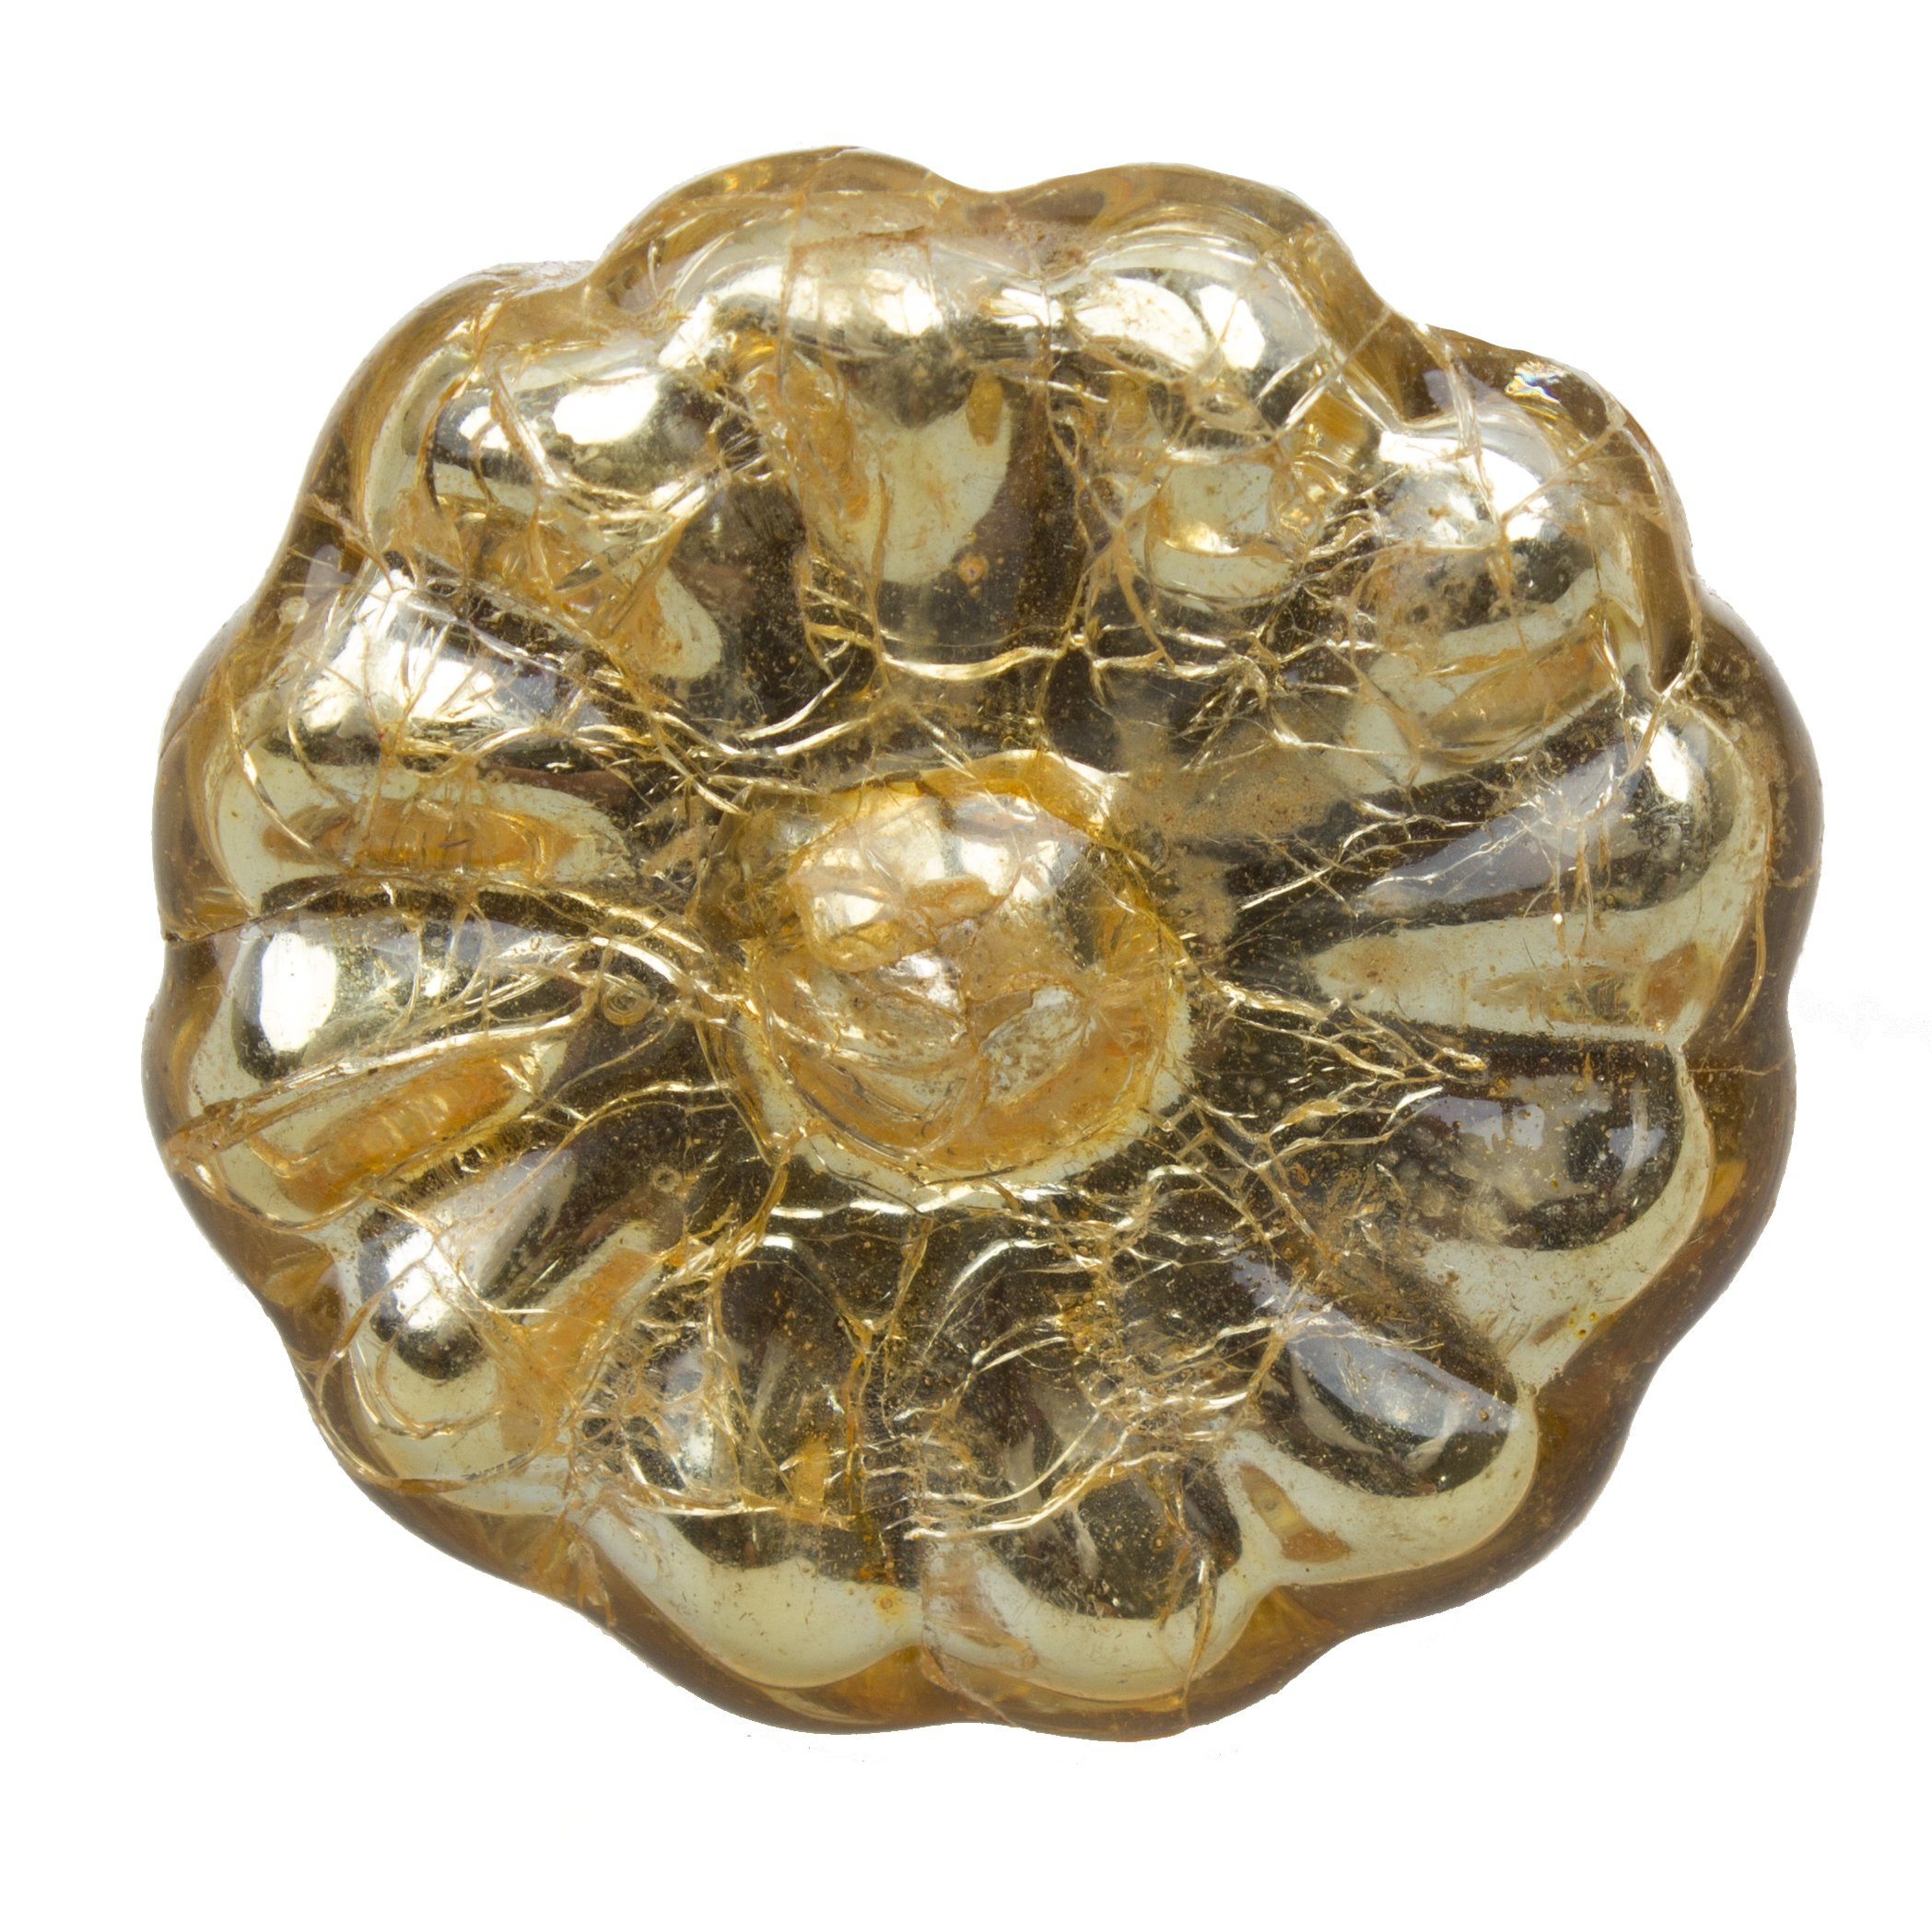 GlideRite Hardware 231007-M-1 Type Hooks Round Mercury Glass Cabinet Knob, 1.625'', Gold